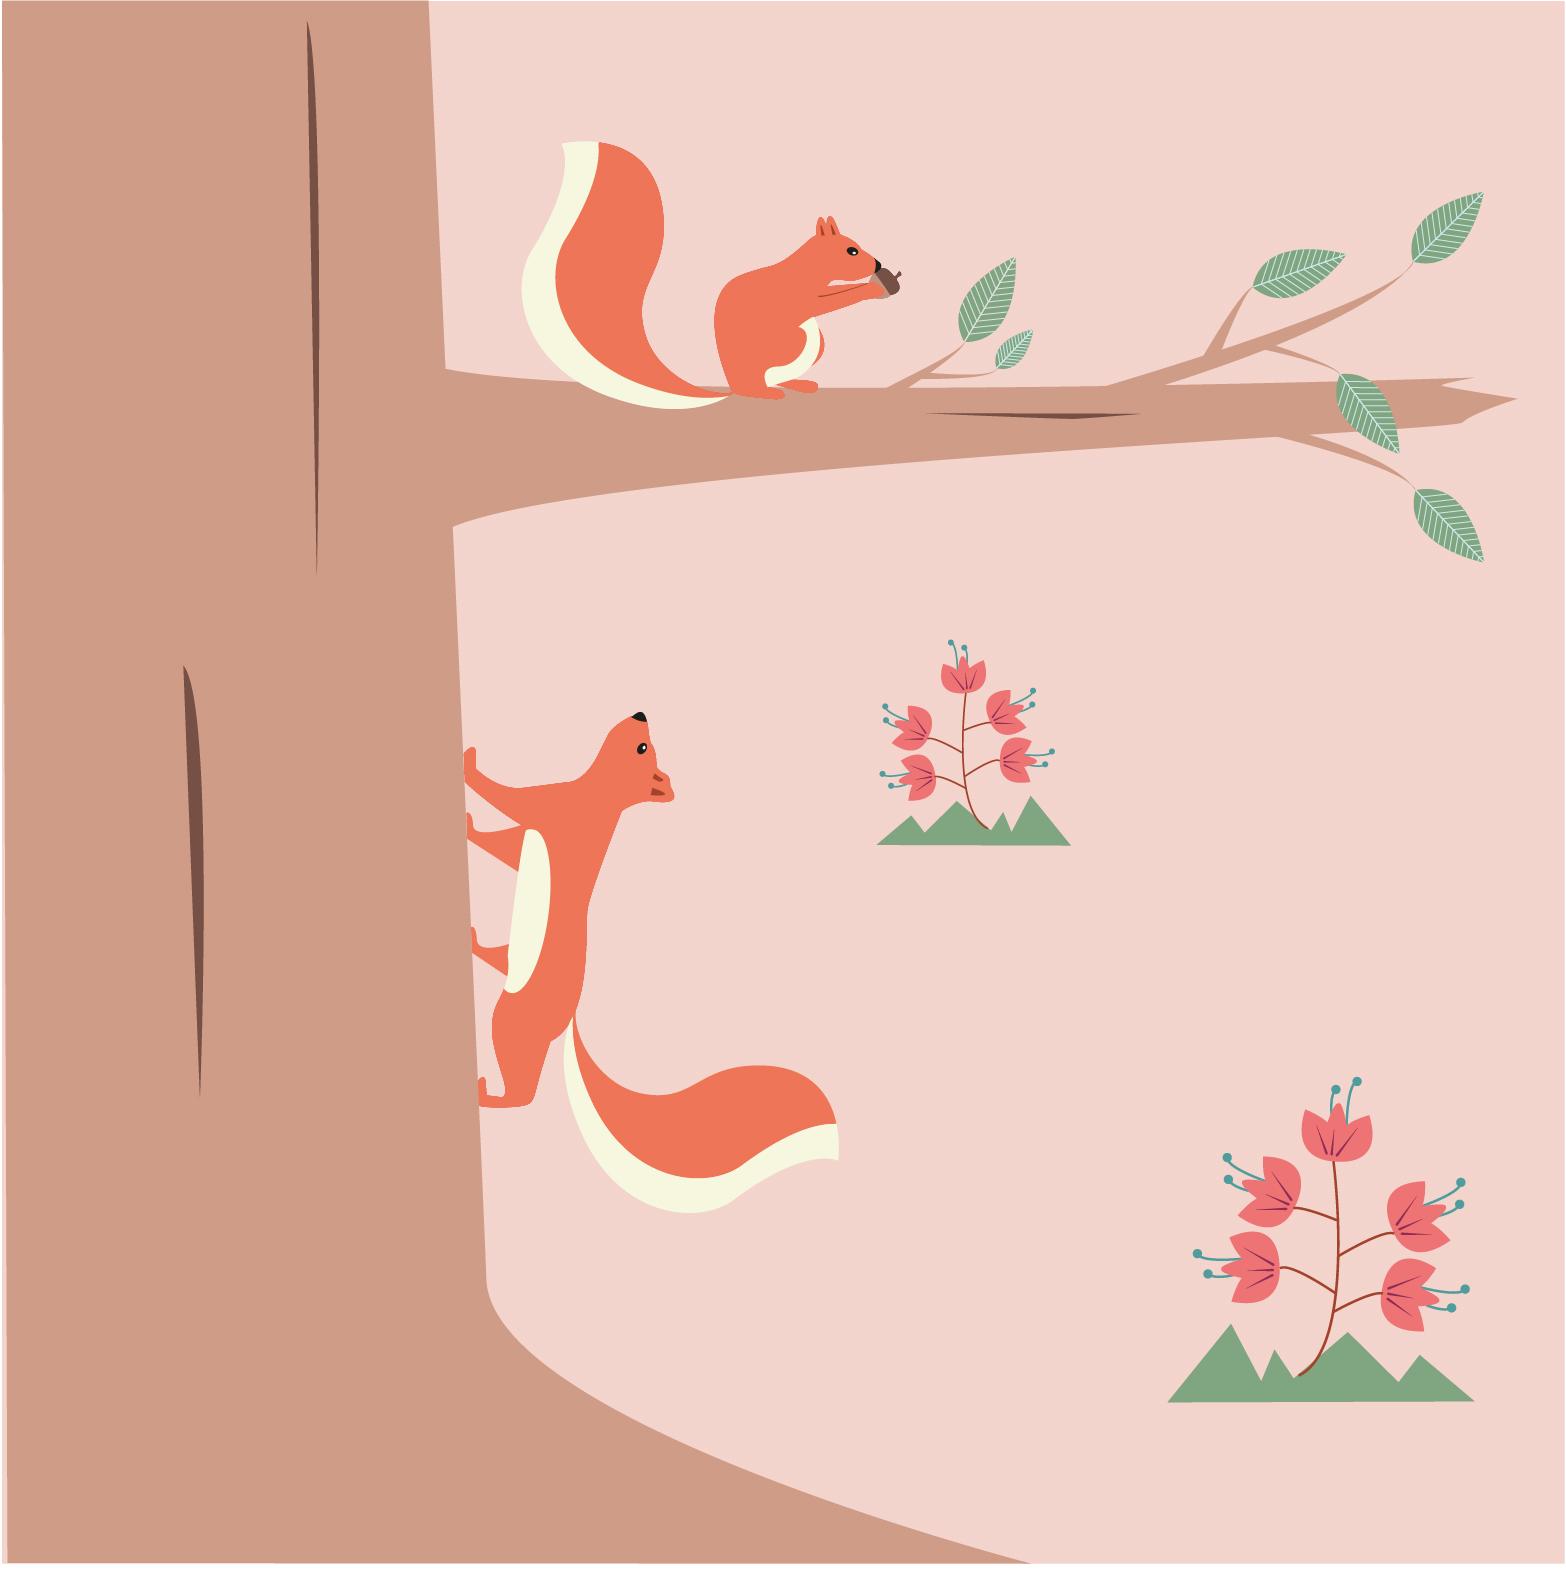 Illustratie eekhoorn -illustrator Dots & Lines - Tilburg